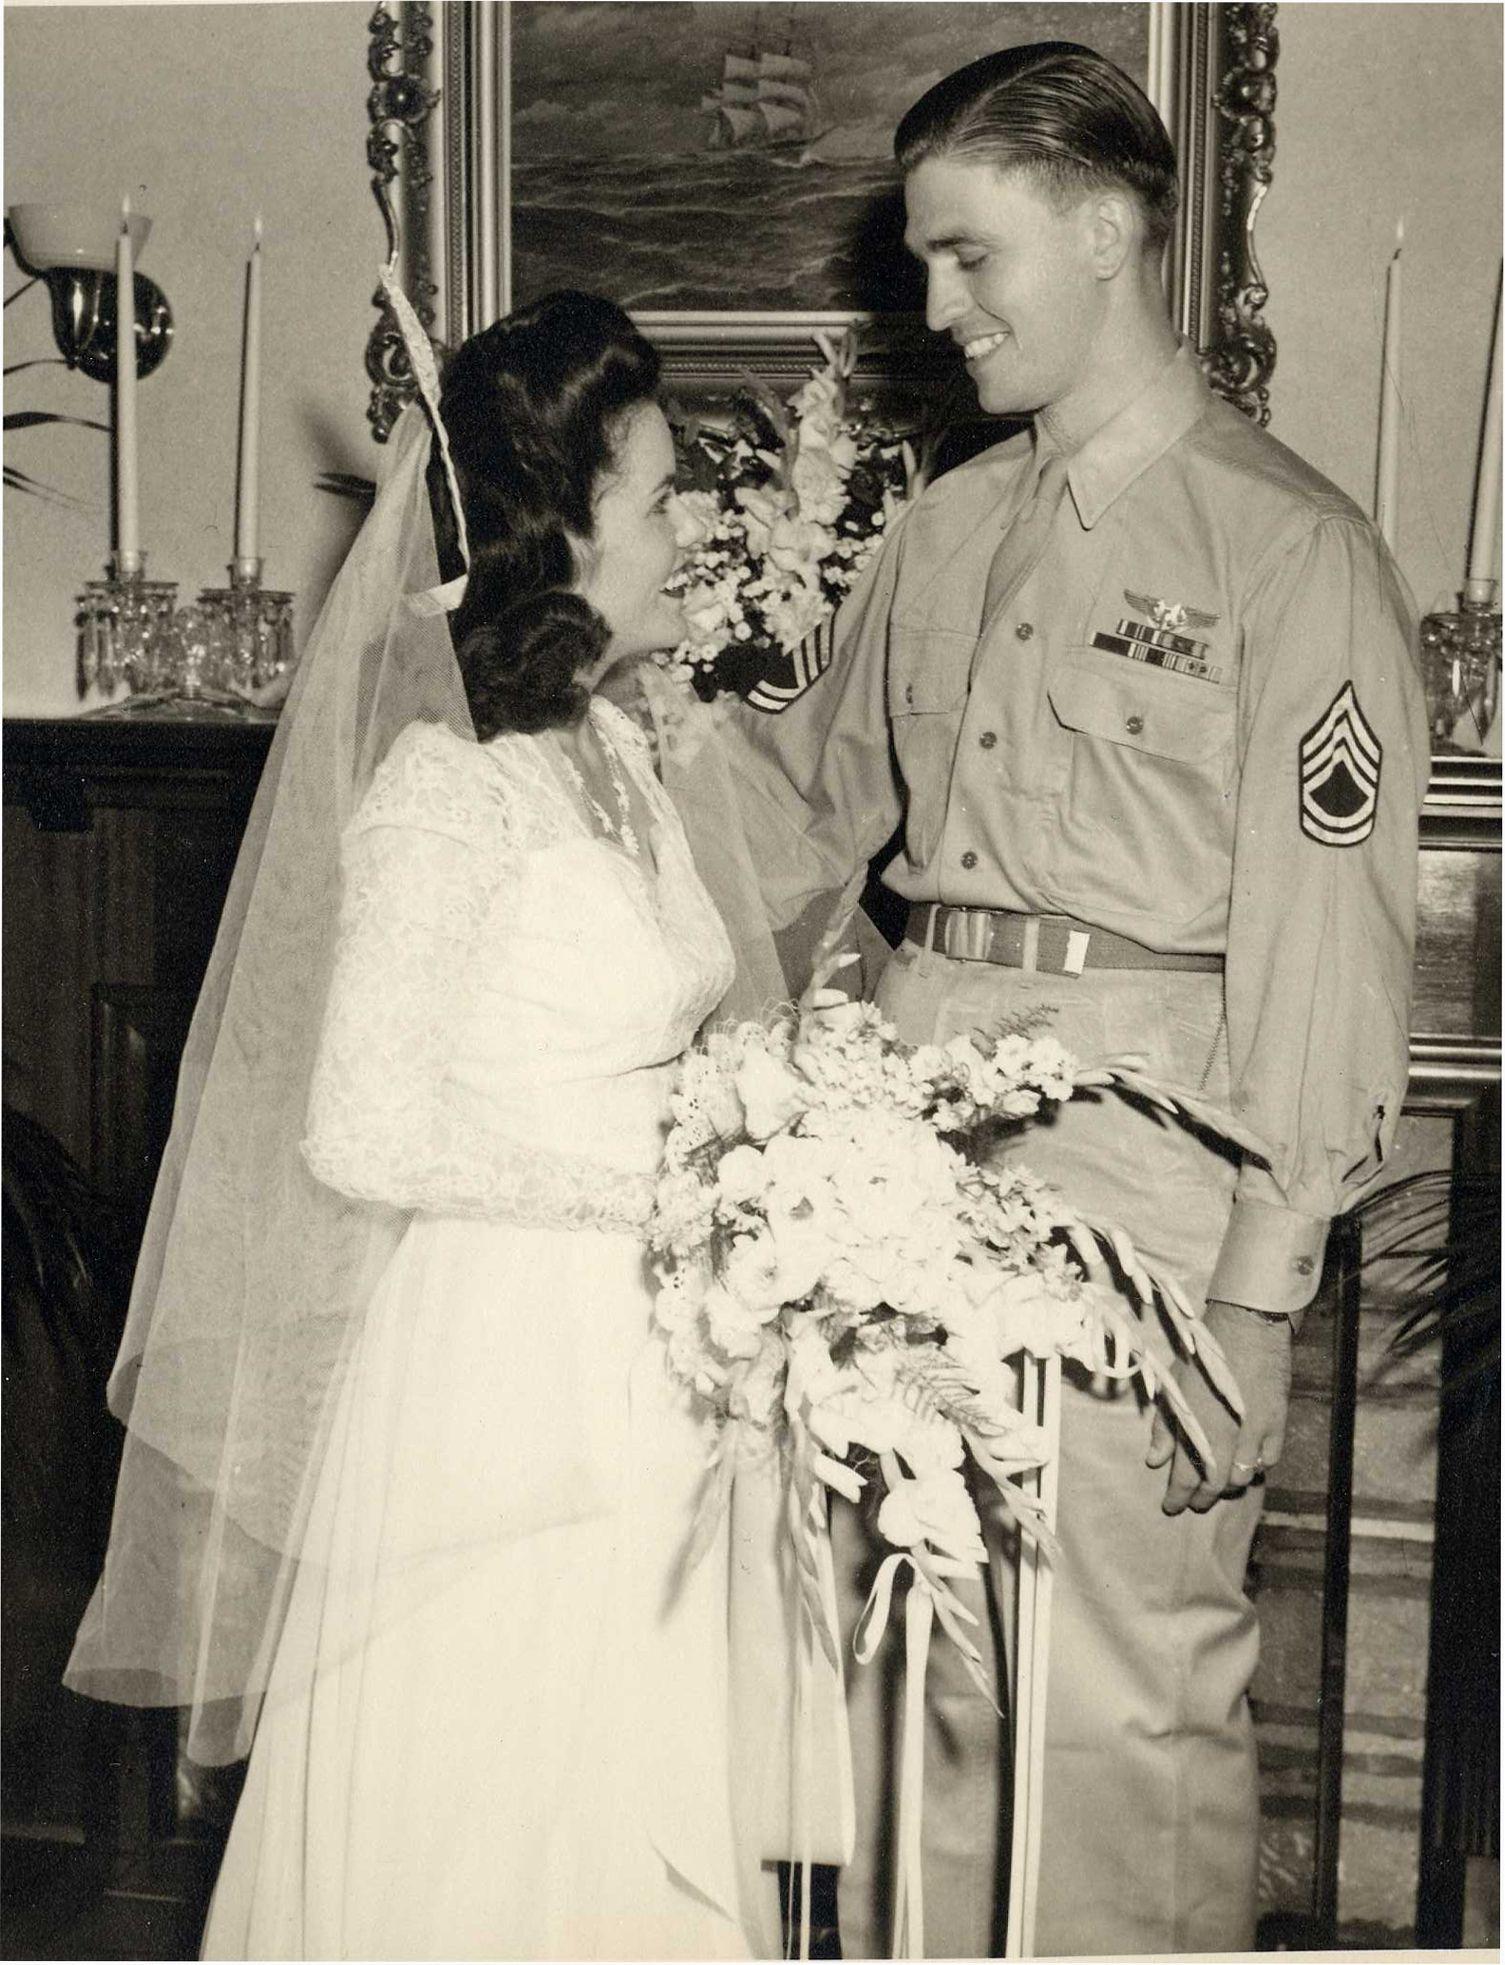 Lisa and Paul, Missouri, 1945 | World War II Couples | Pinterest ...